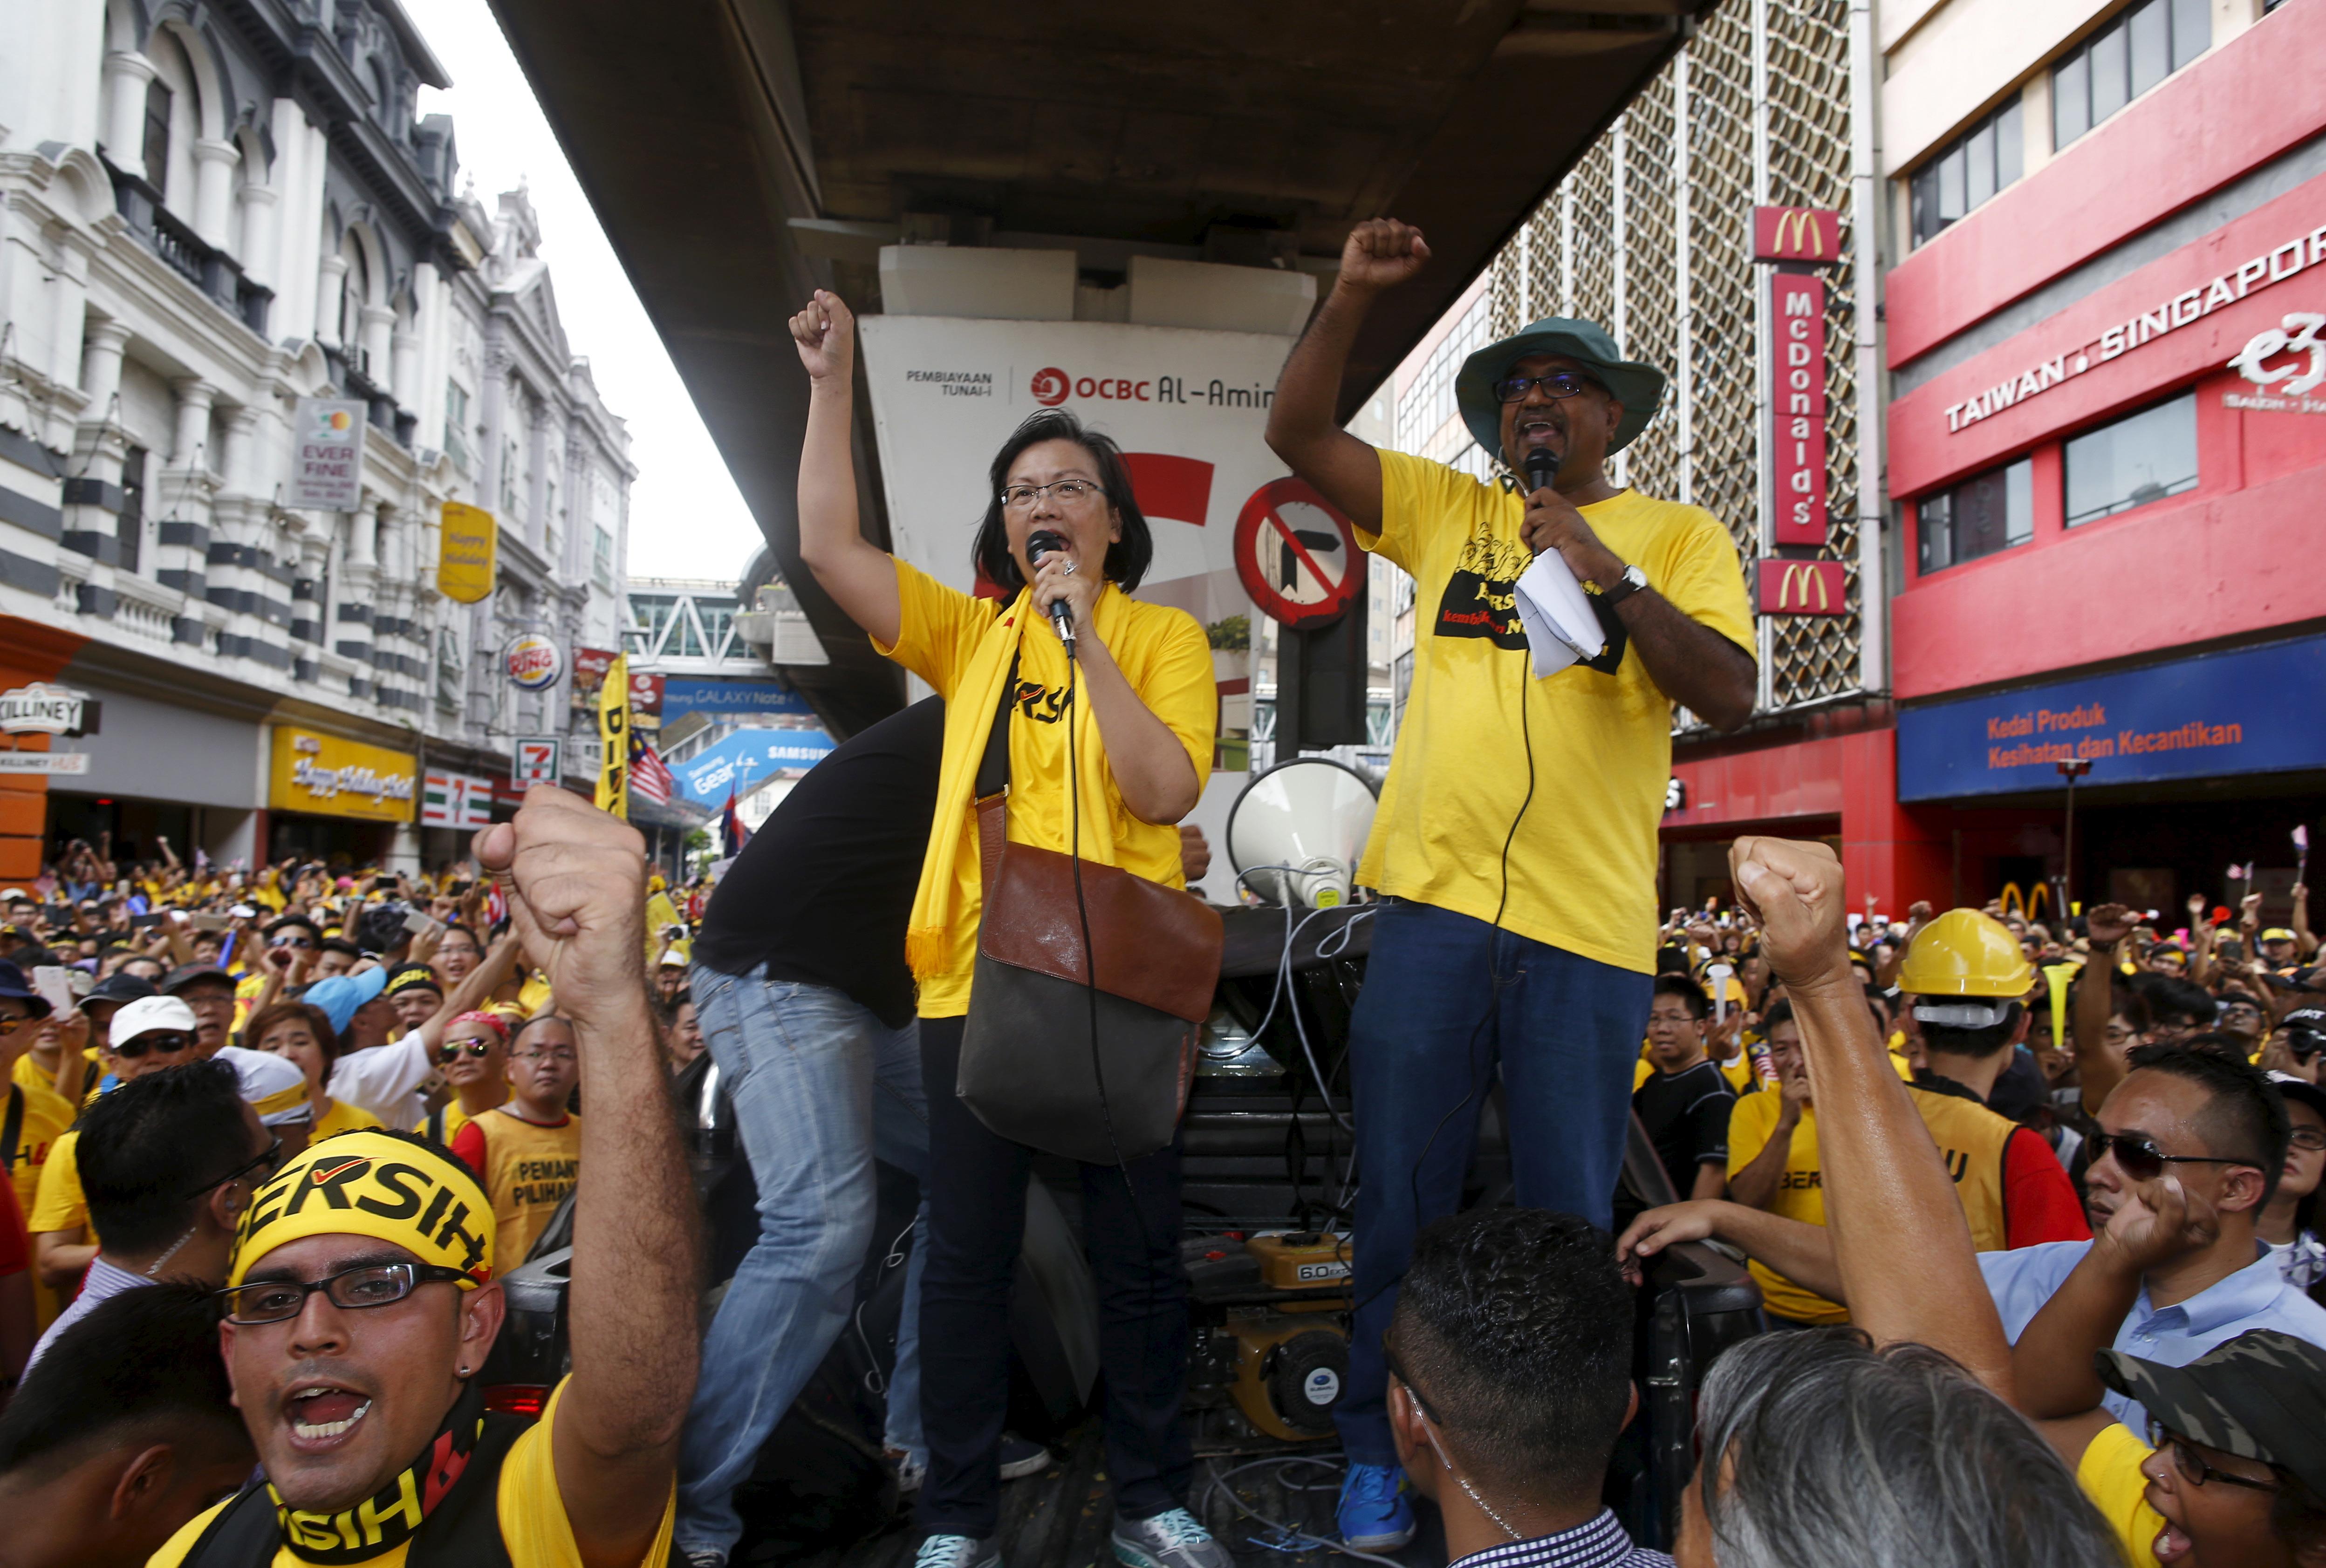 "Pro-democracy group ""Bersih"" (Clean) chairwoman Maria Chin Abdullah rallies supporters as they prepare to march towards Dataran Merdeka in Malaysia's capital city of Kuala Lumpur"